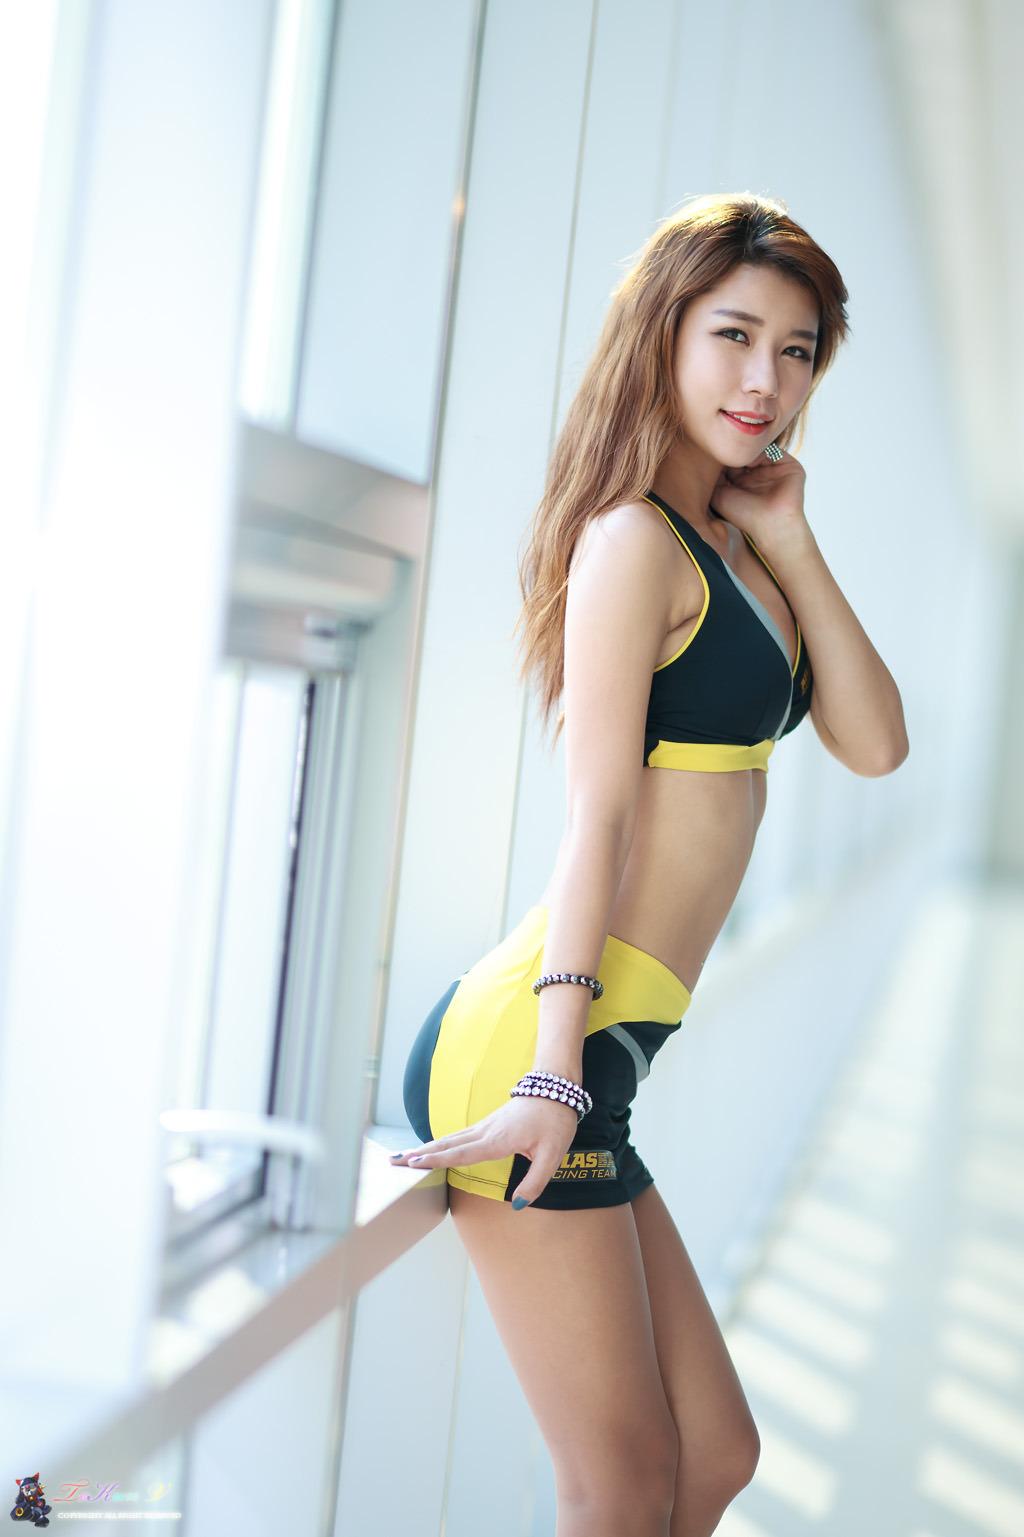 Boobs Bikini Kim Yoo Yeon naked photo 2017